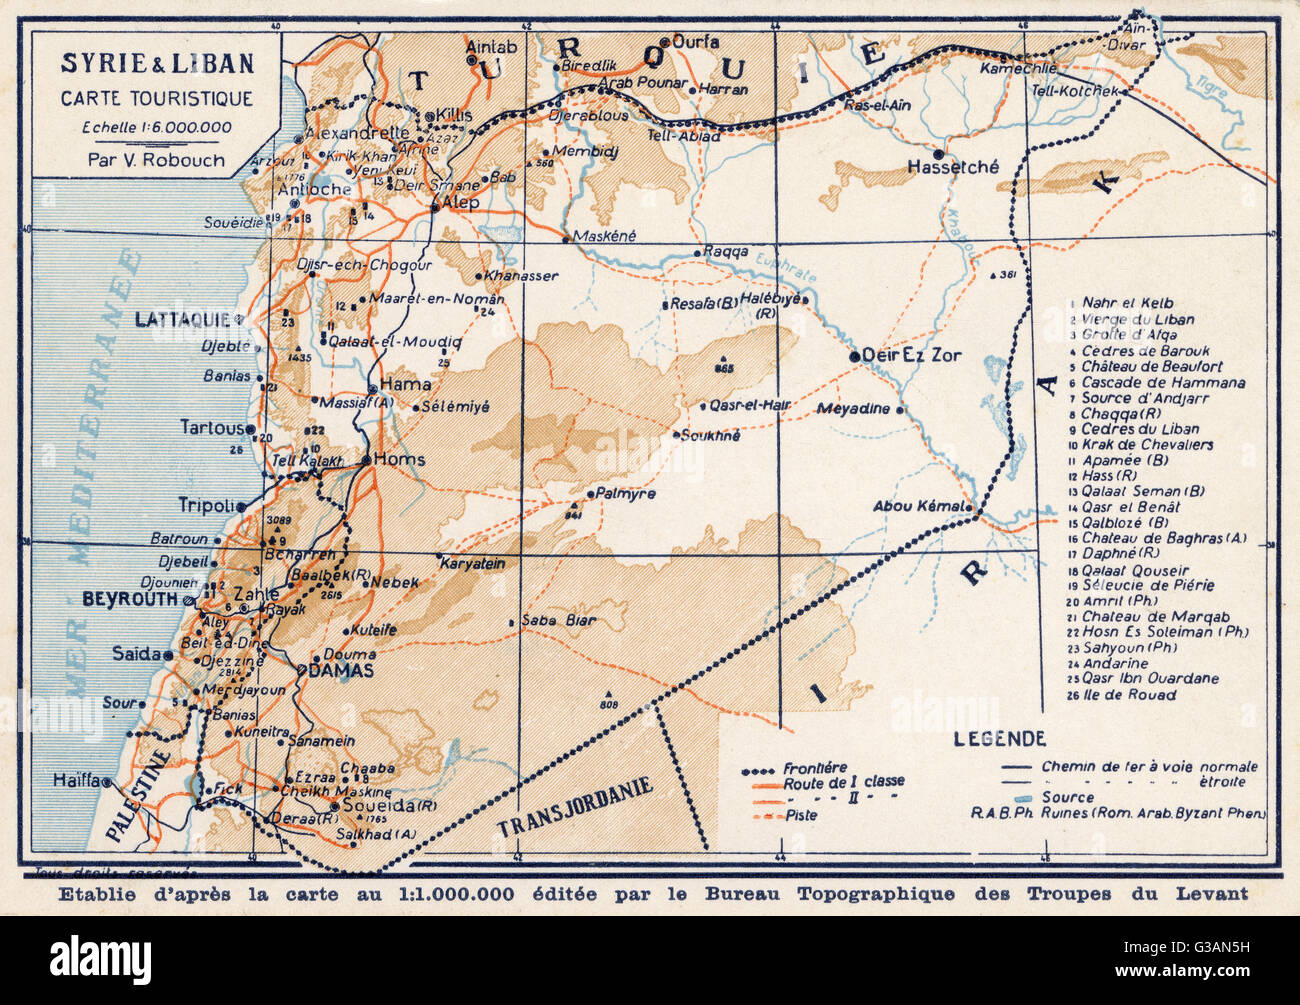 Syria and lebanon tourist map date circa 1910s stock photo syria and lebanon tourist map date circa 1910s sciox Gallery